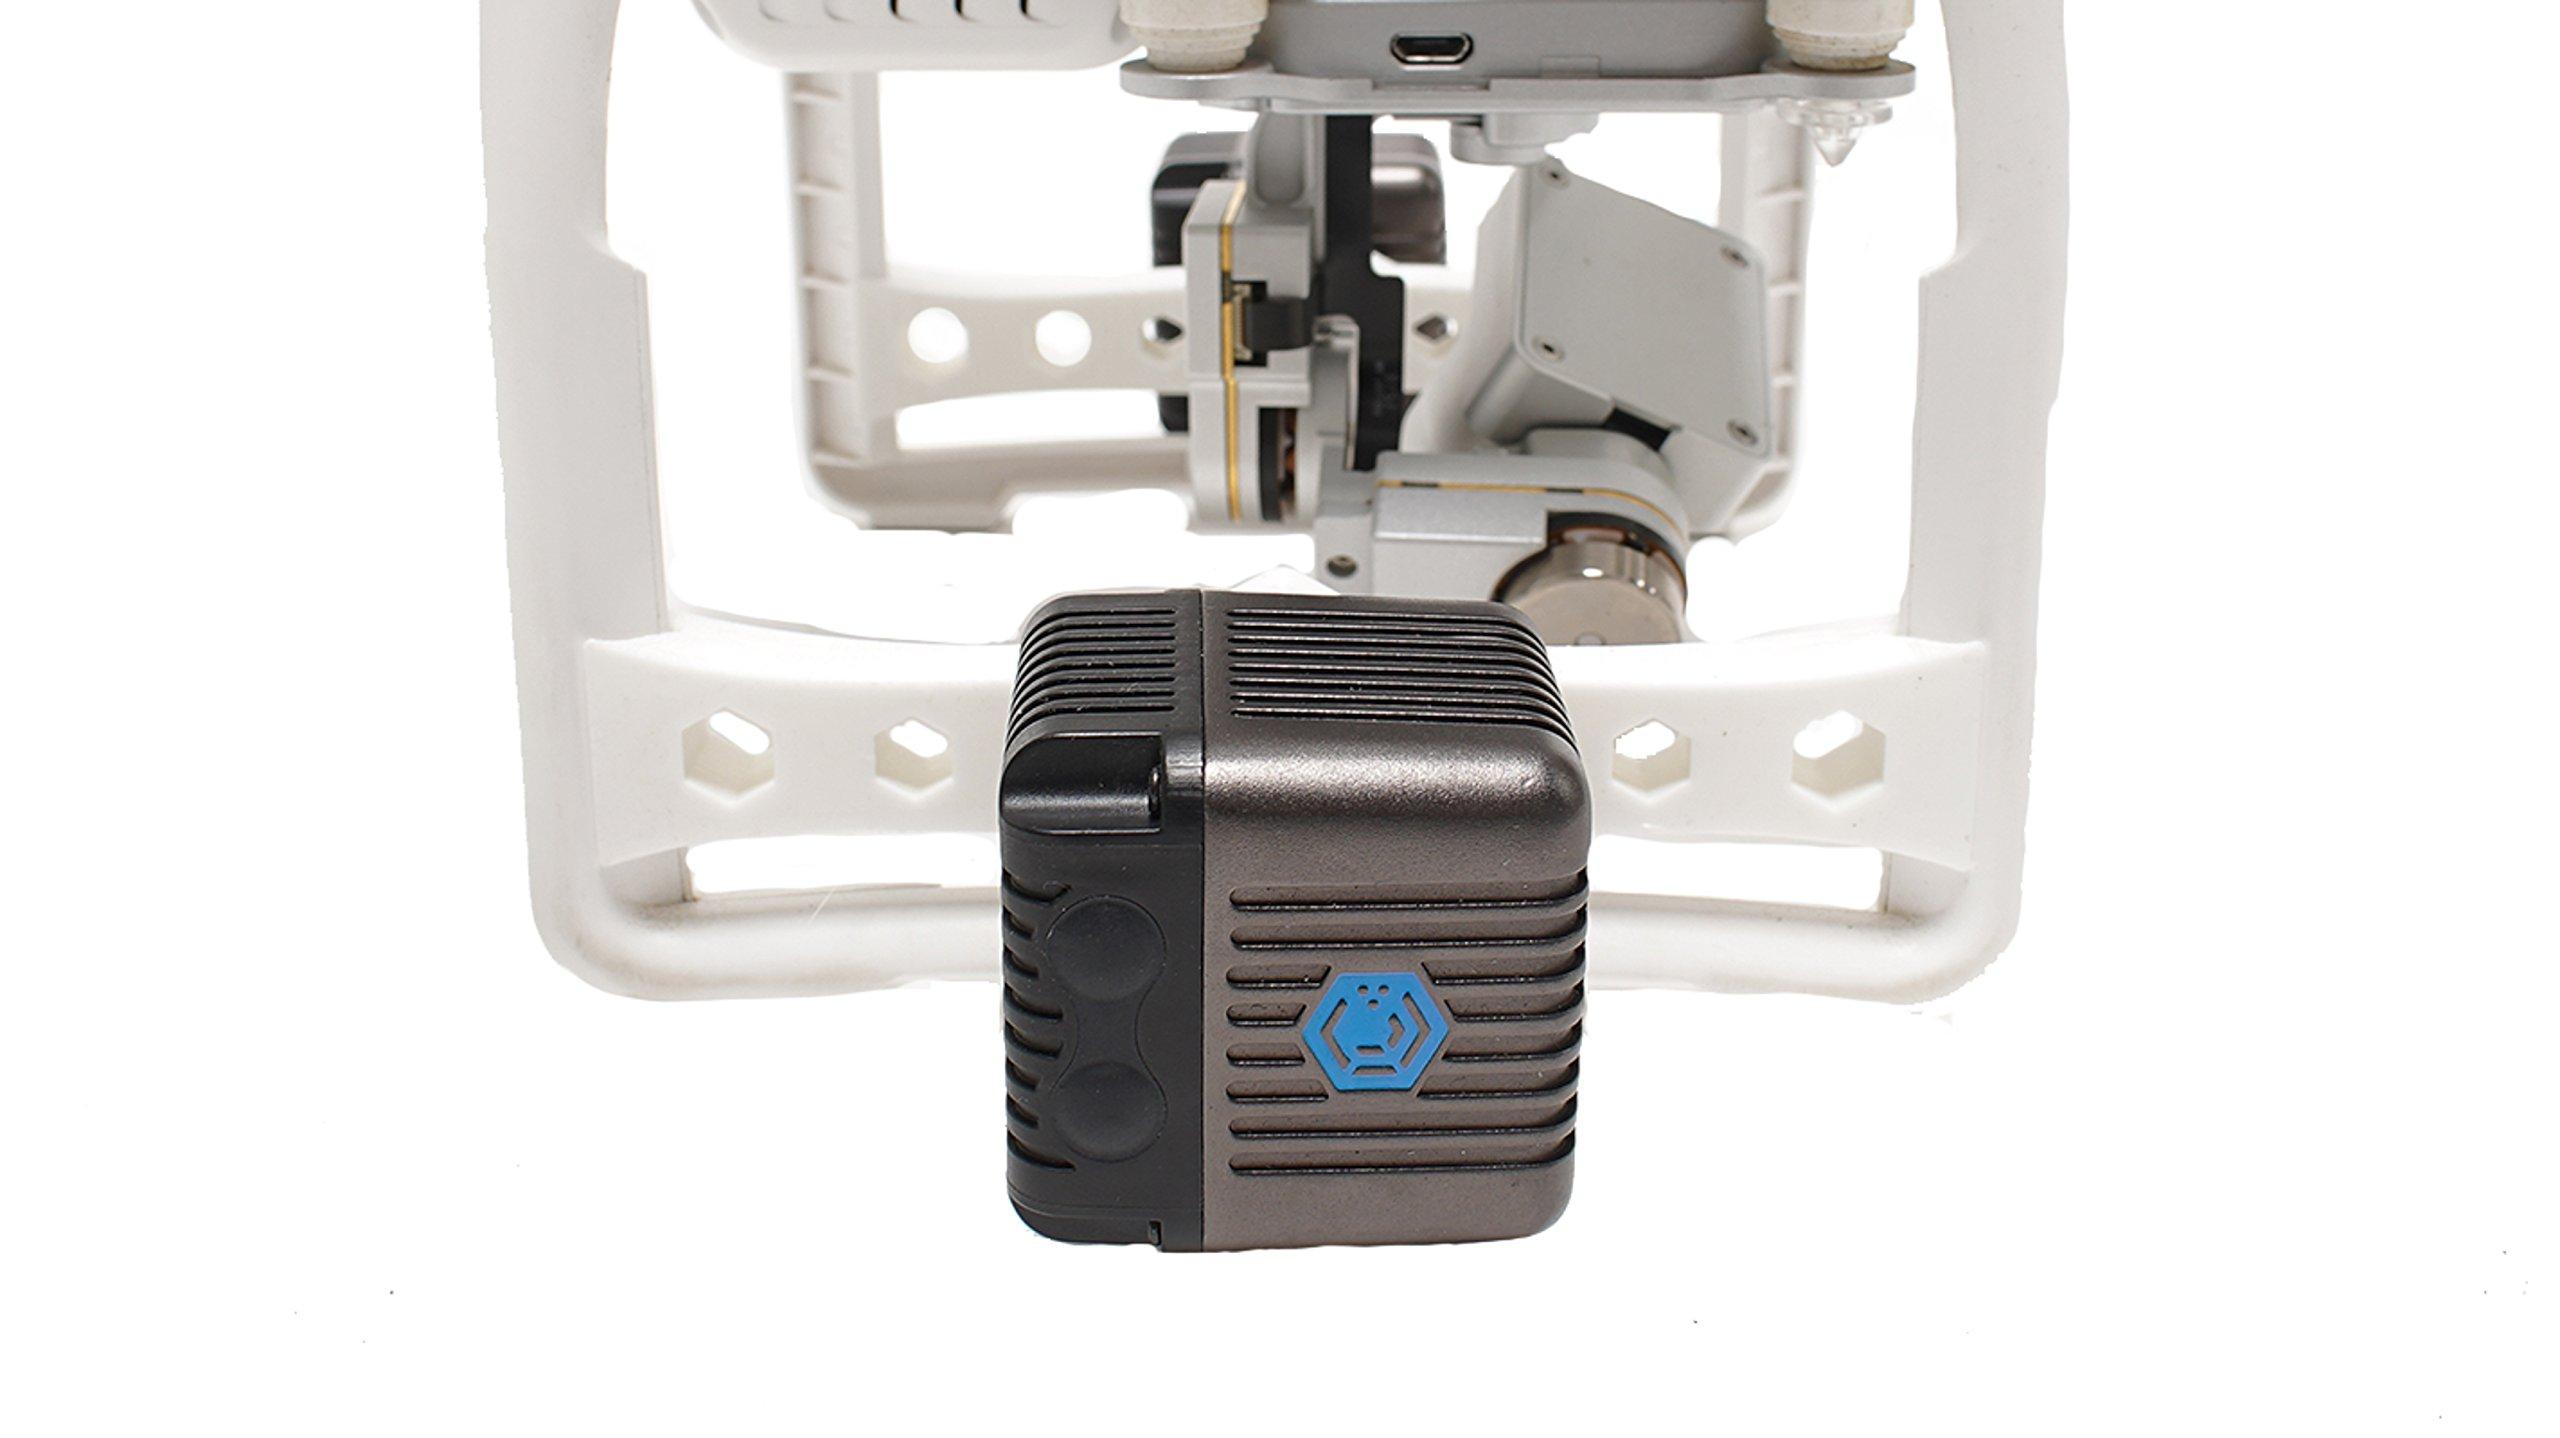 Lume Cube - Mounts for DJI Phantom 3 Drone (White) (Includes 2 Mounts)